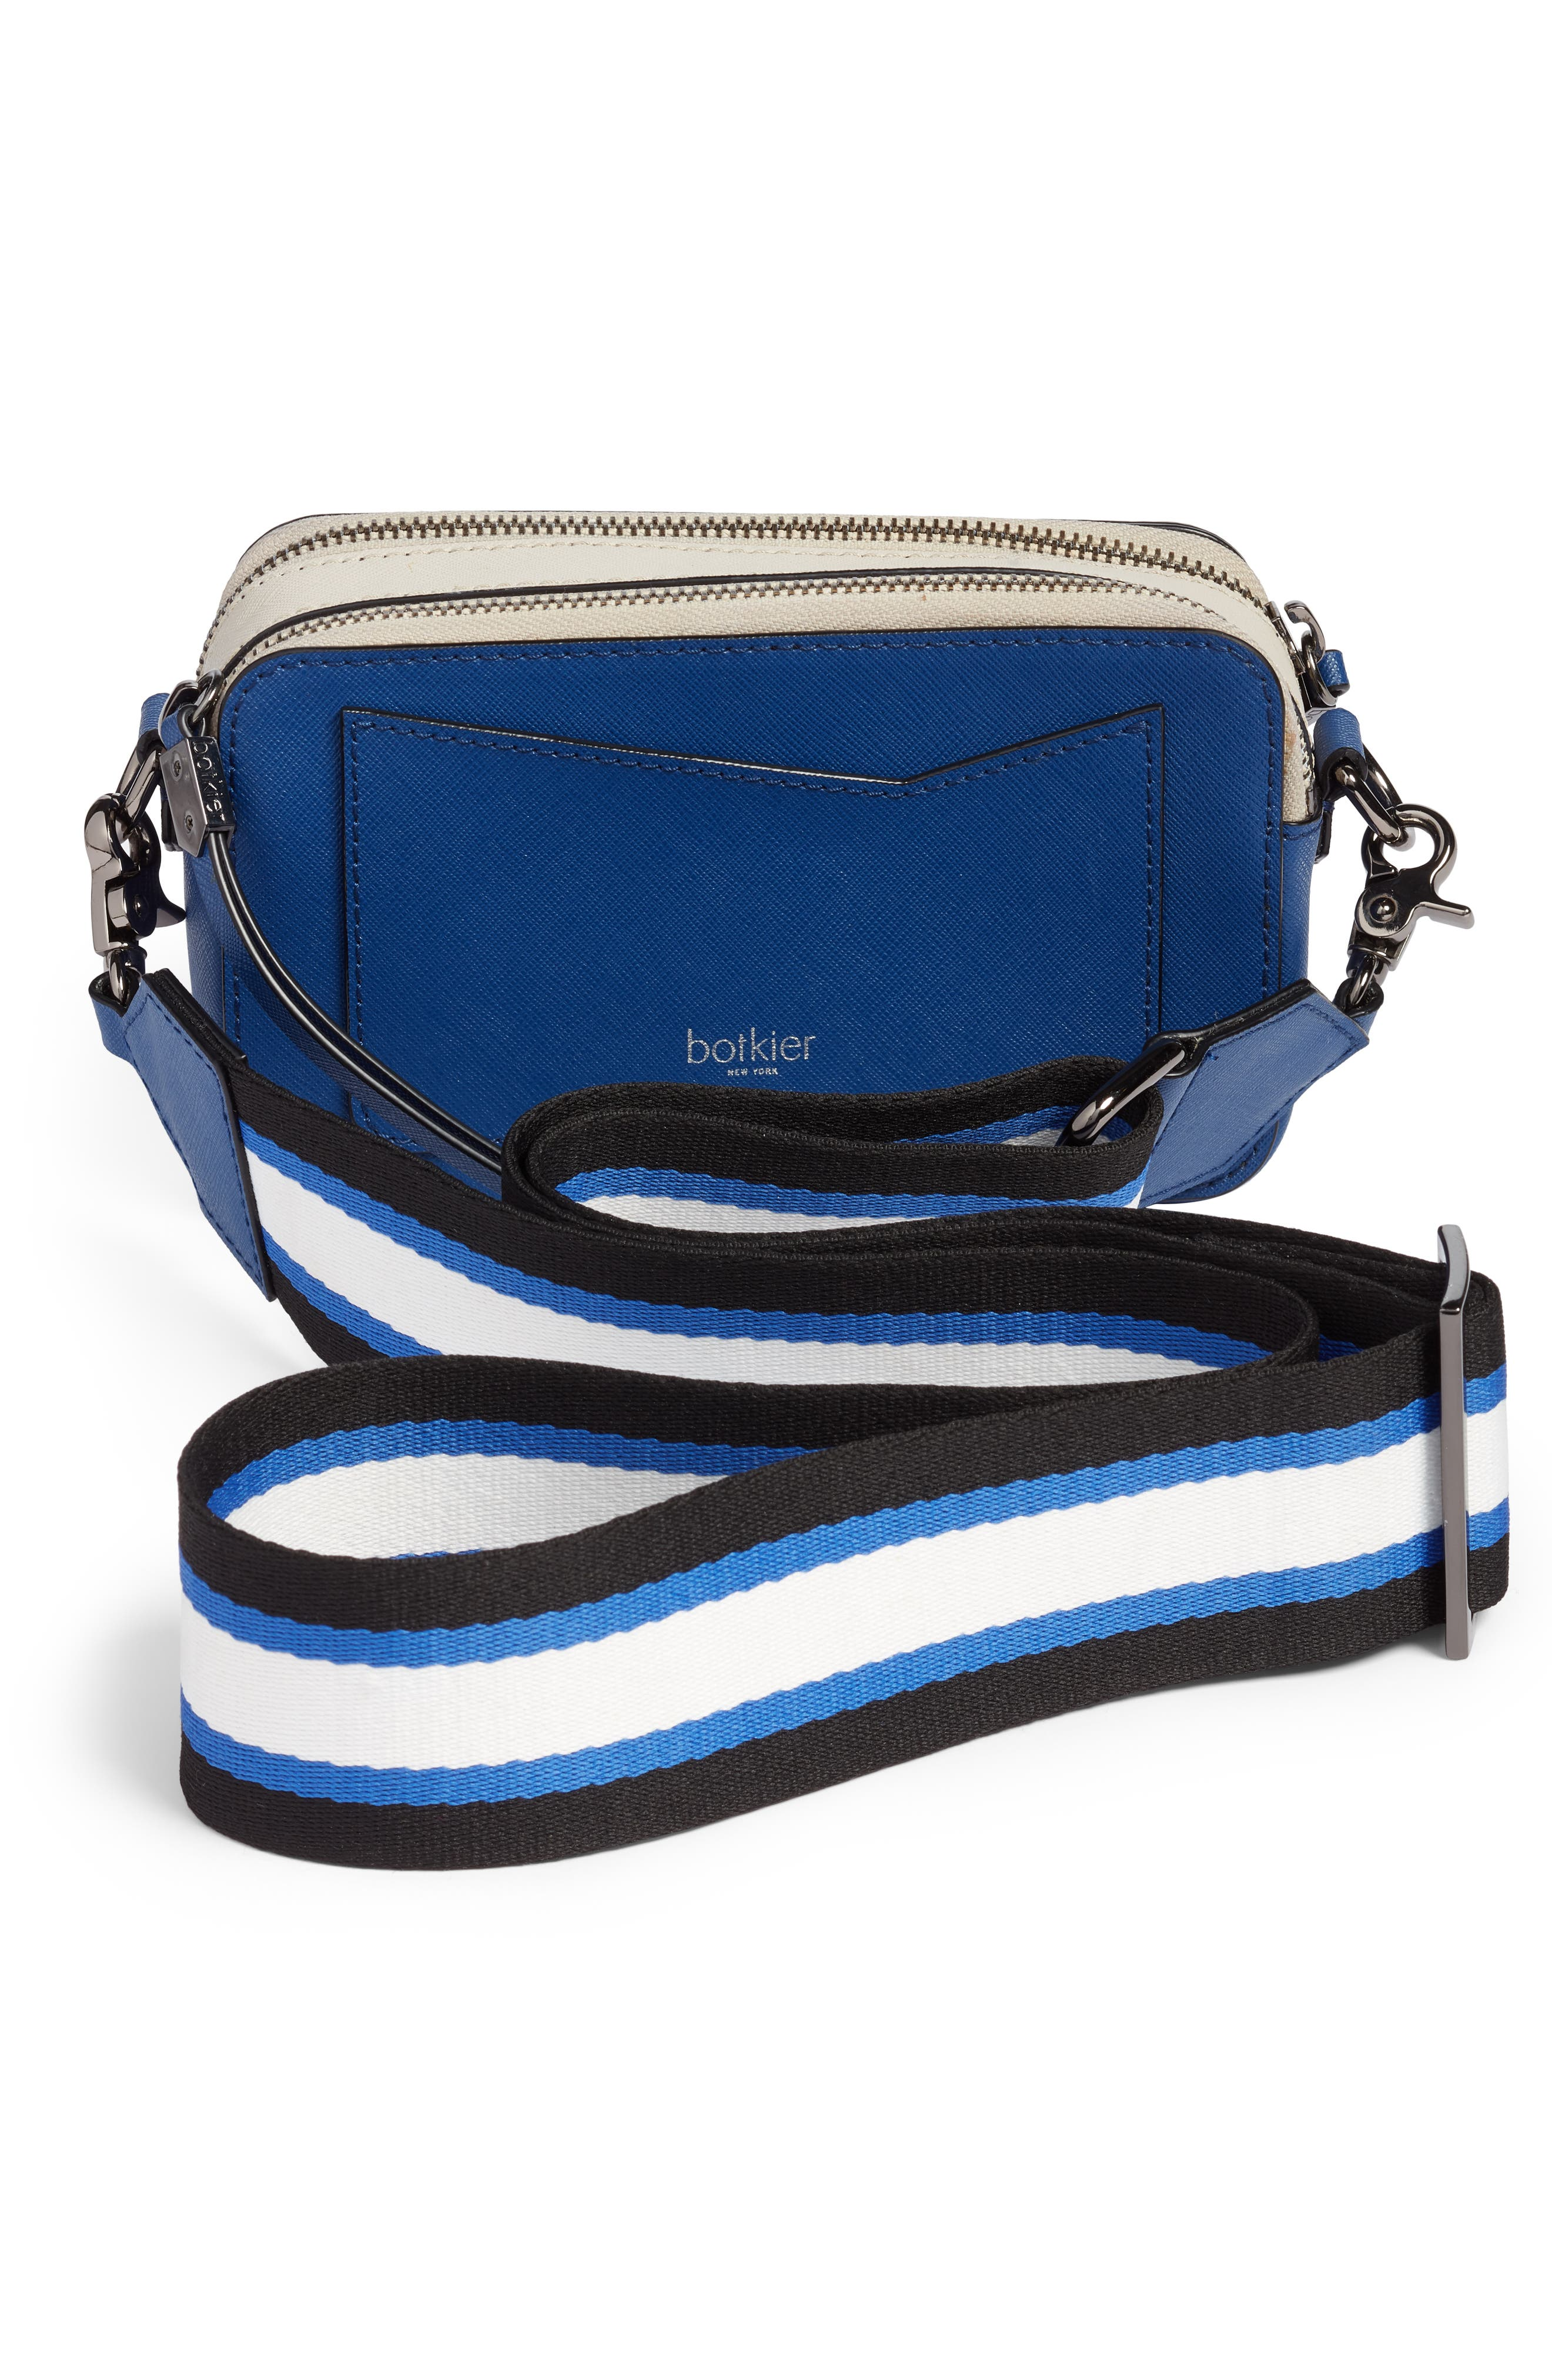 Cobble Hill Mini Crossbody Camera Bag,                             Alternate thumbnail 3, color,                             WINTER BLUE COMBO